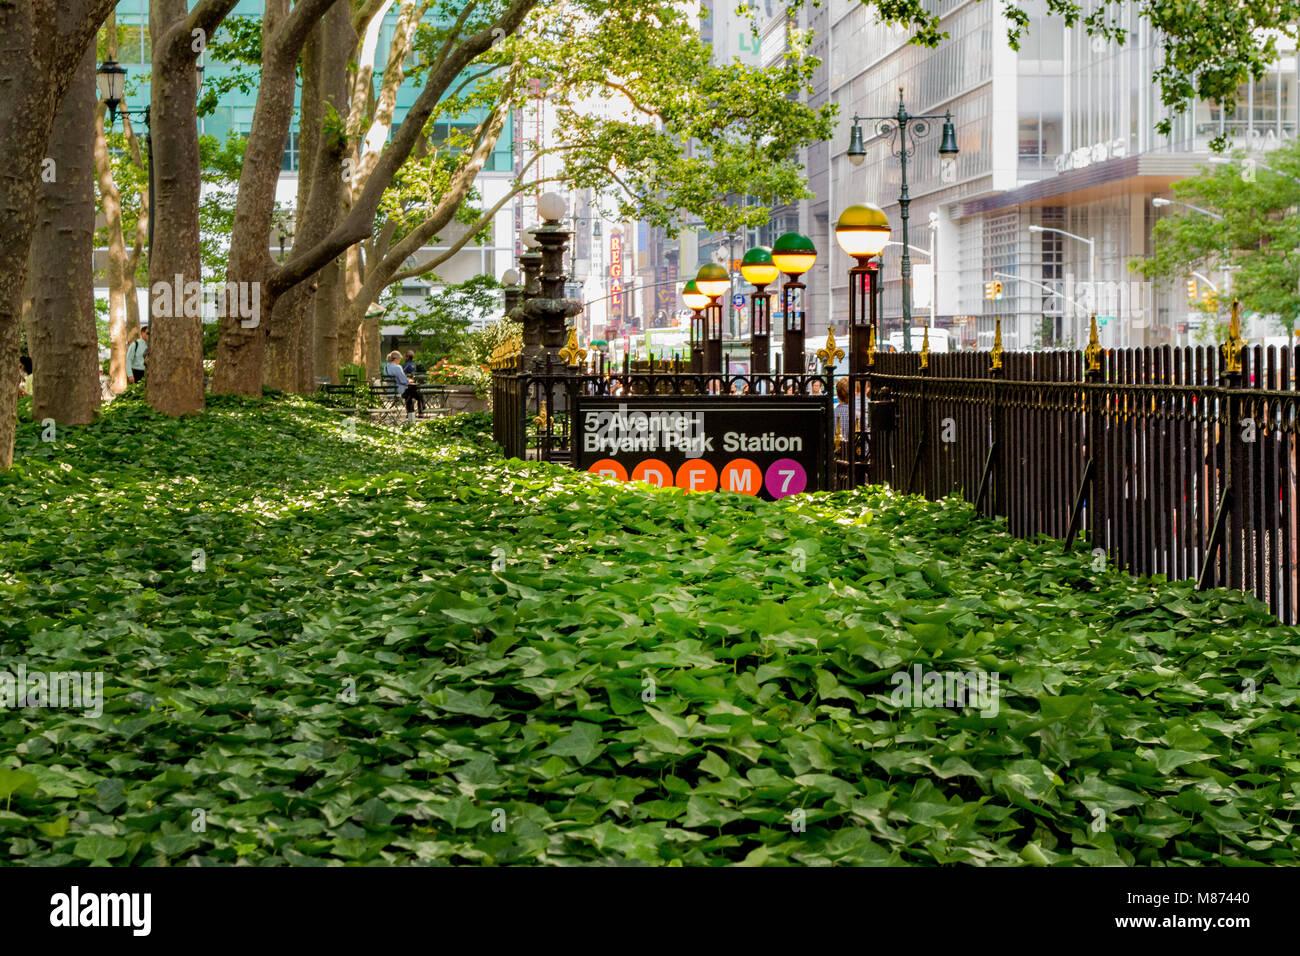 A sea of green vegetation leading to Bryant Park Subway Station entrance, Bryant Park ,Manhattan ,New York City - Stock Image